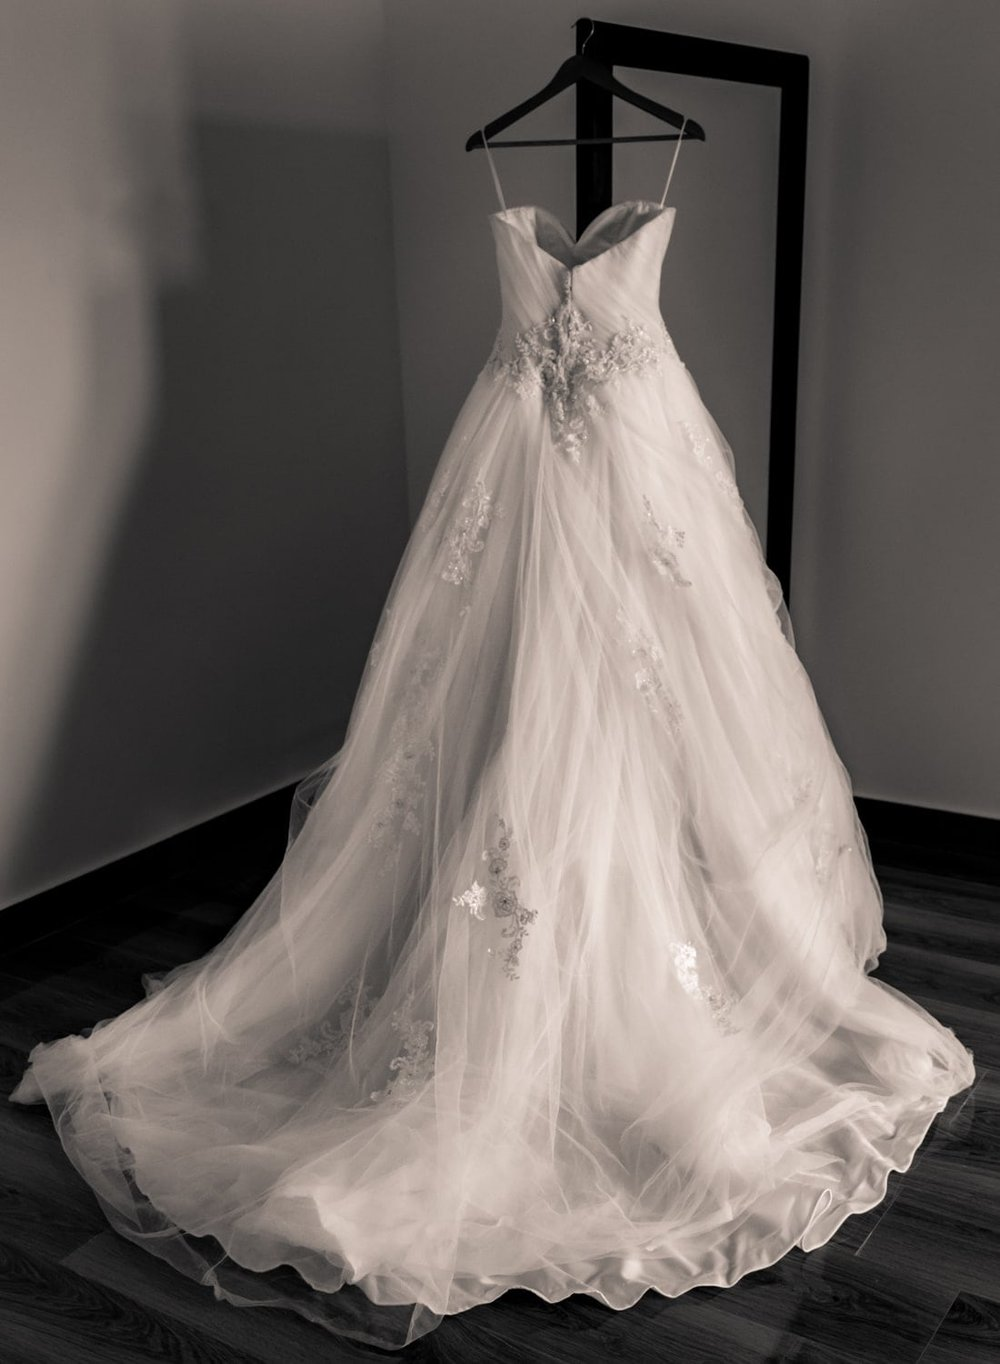 Black and white photo of gorgeous wedding dress.